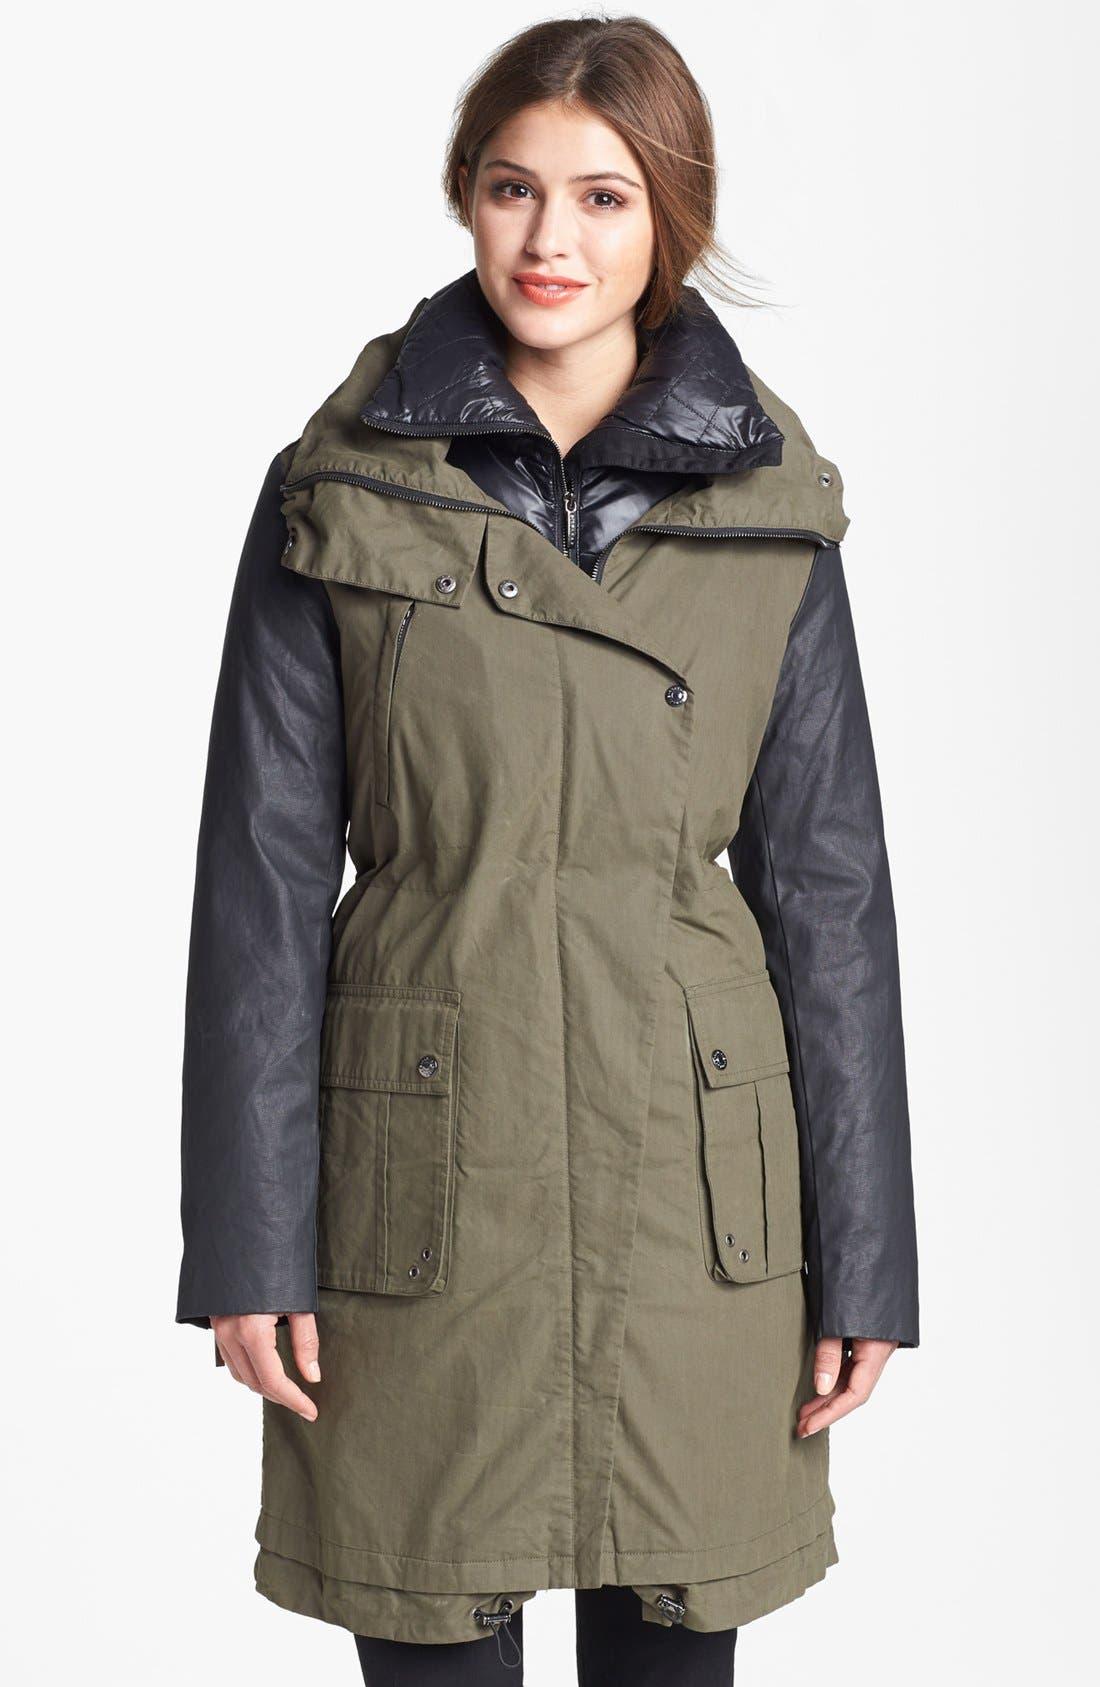 ASHLEY B Coated Sleeve Parka with Down Jacket, Main, color, 303